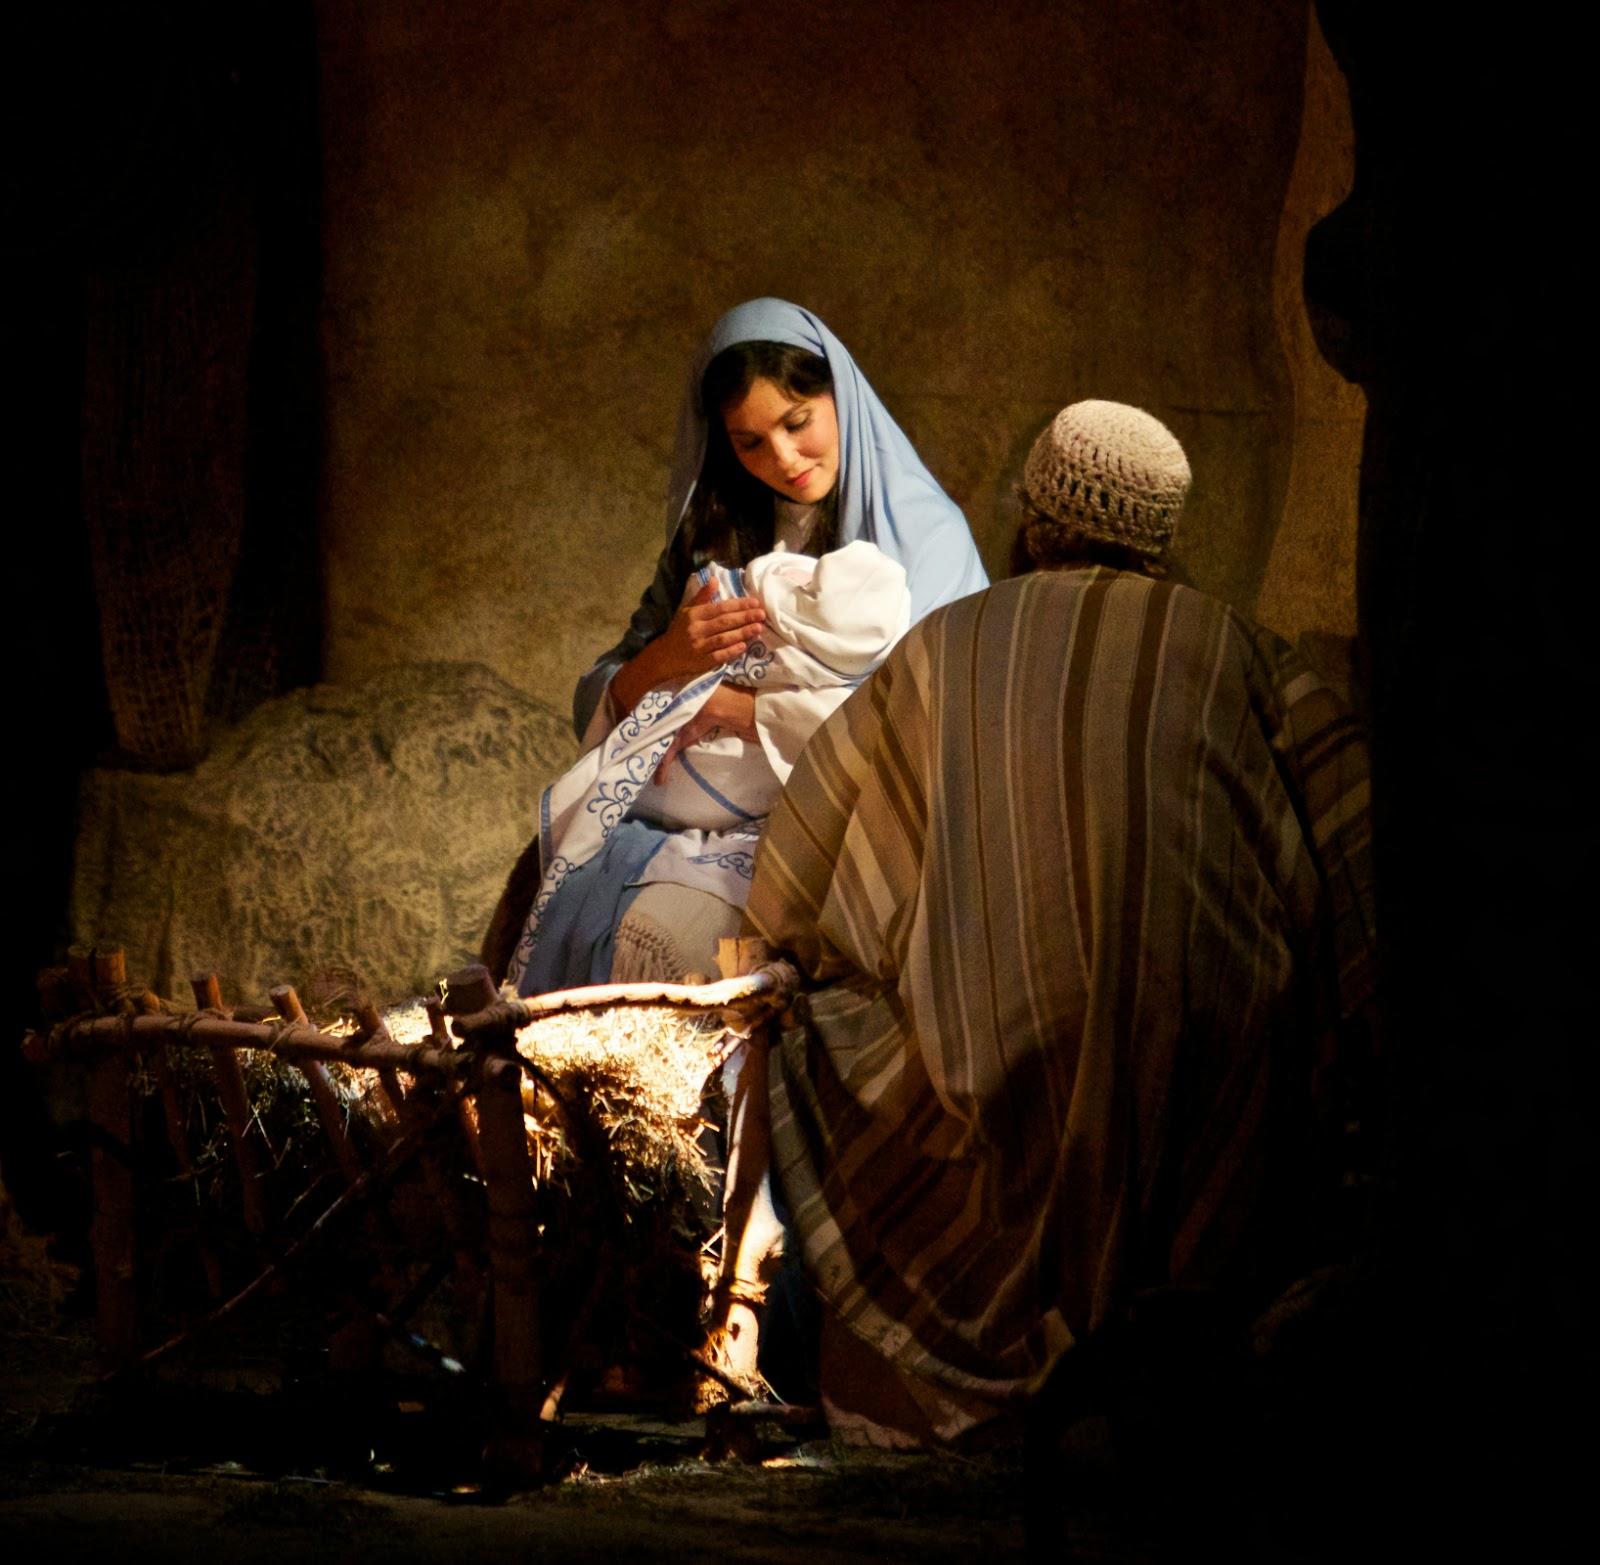 nativity jesus christ lds wallpaper - photo #8